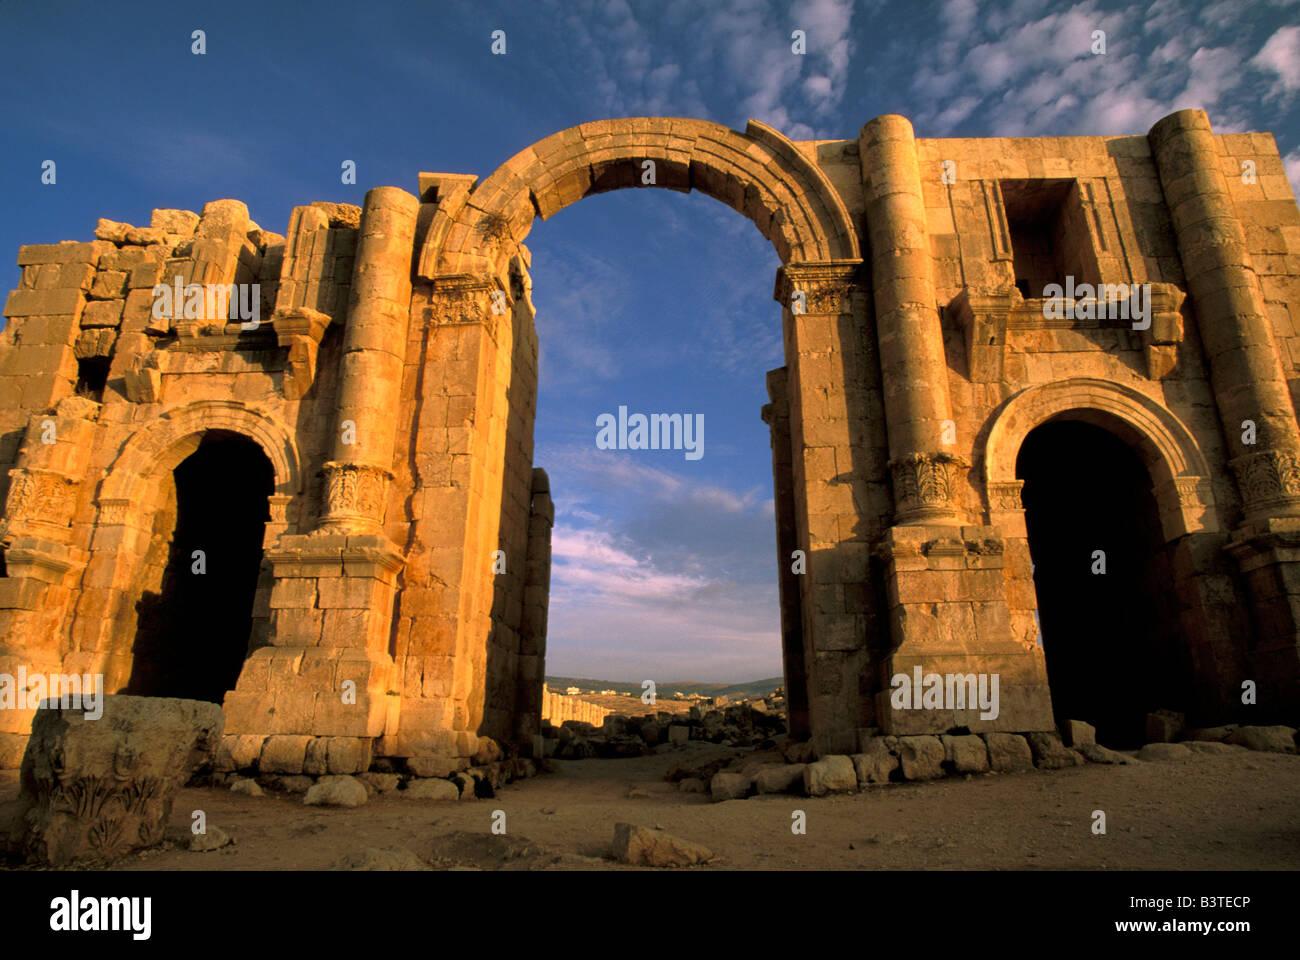 Asia, Jordan, Jerash. Arch of triumph, honoring Hadrian. - Stock Image